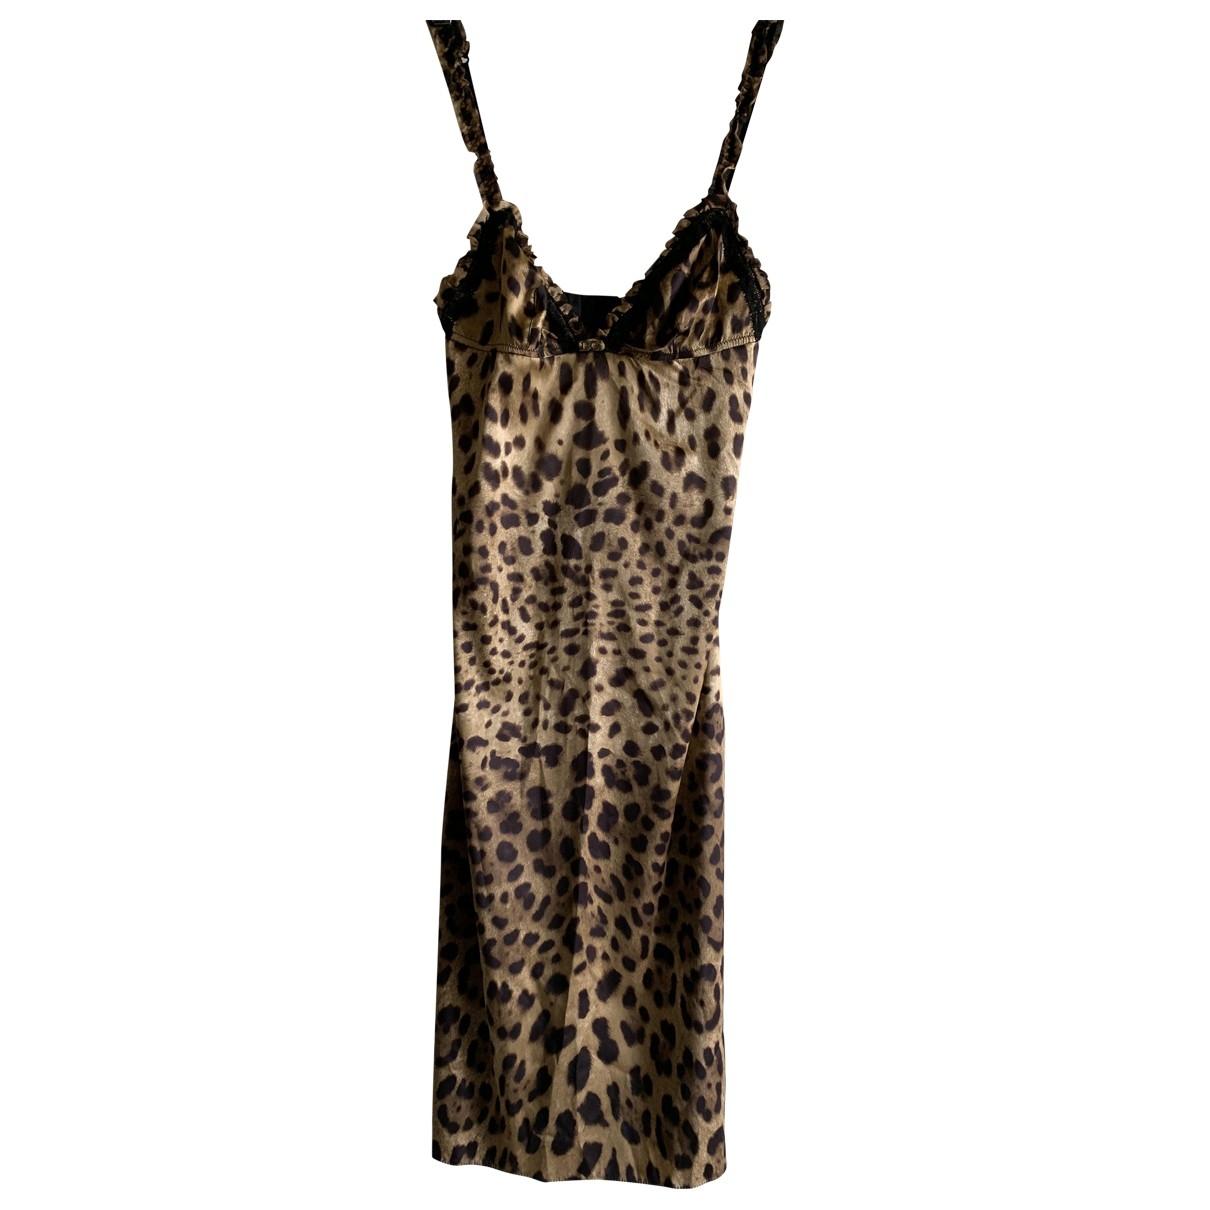 D&g \N dress for Women M International